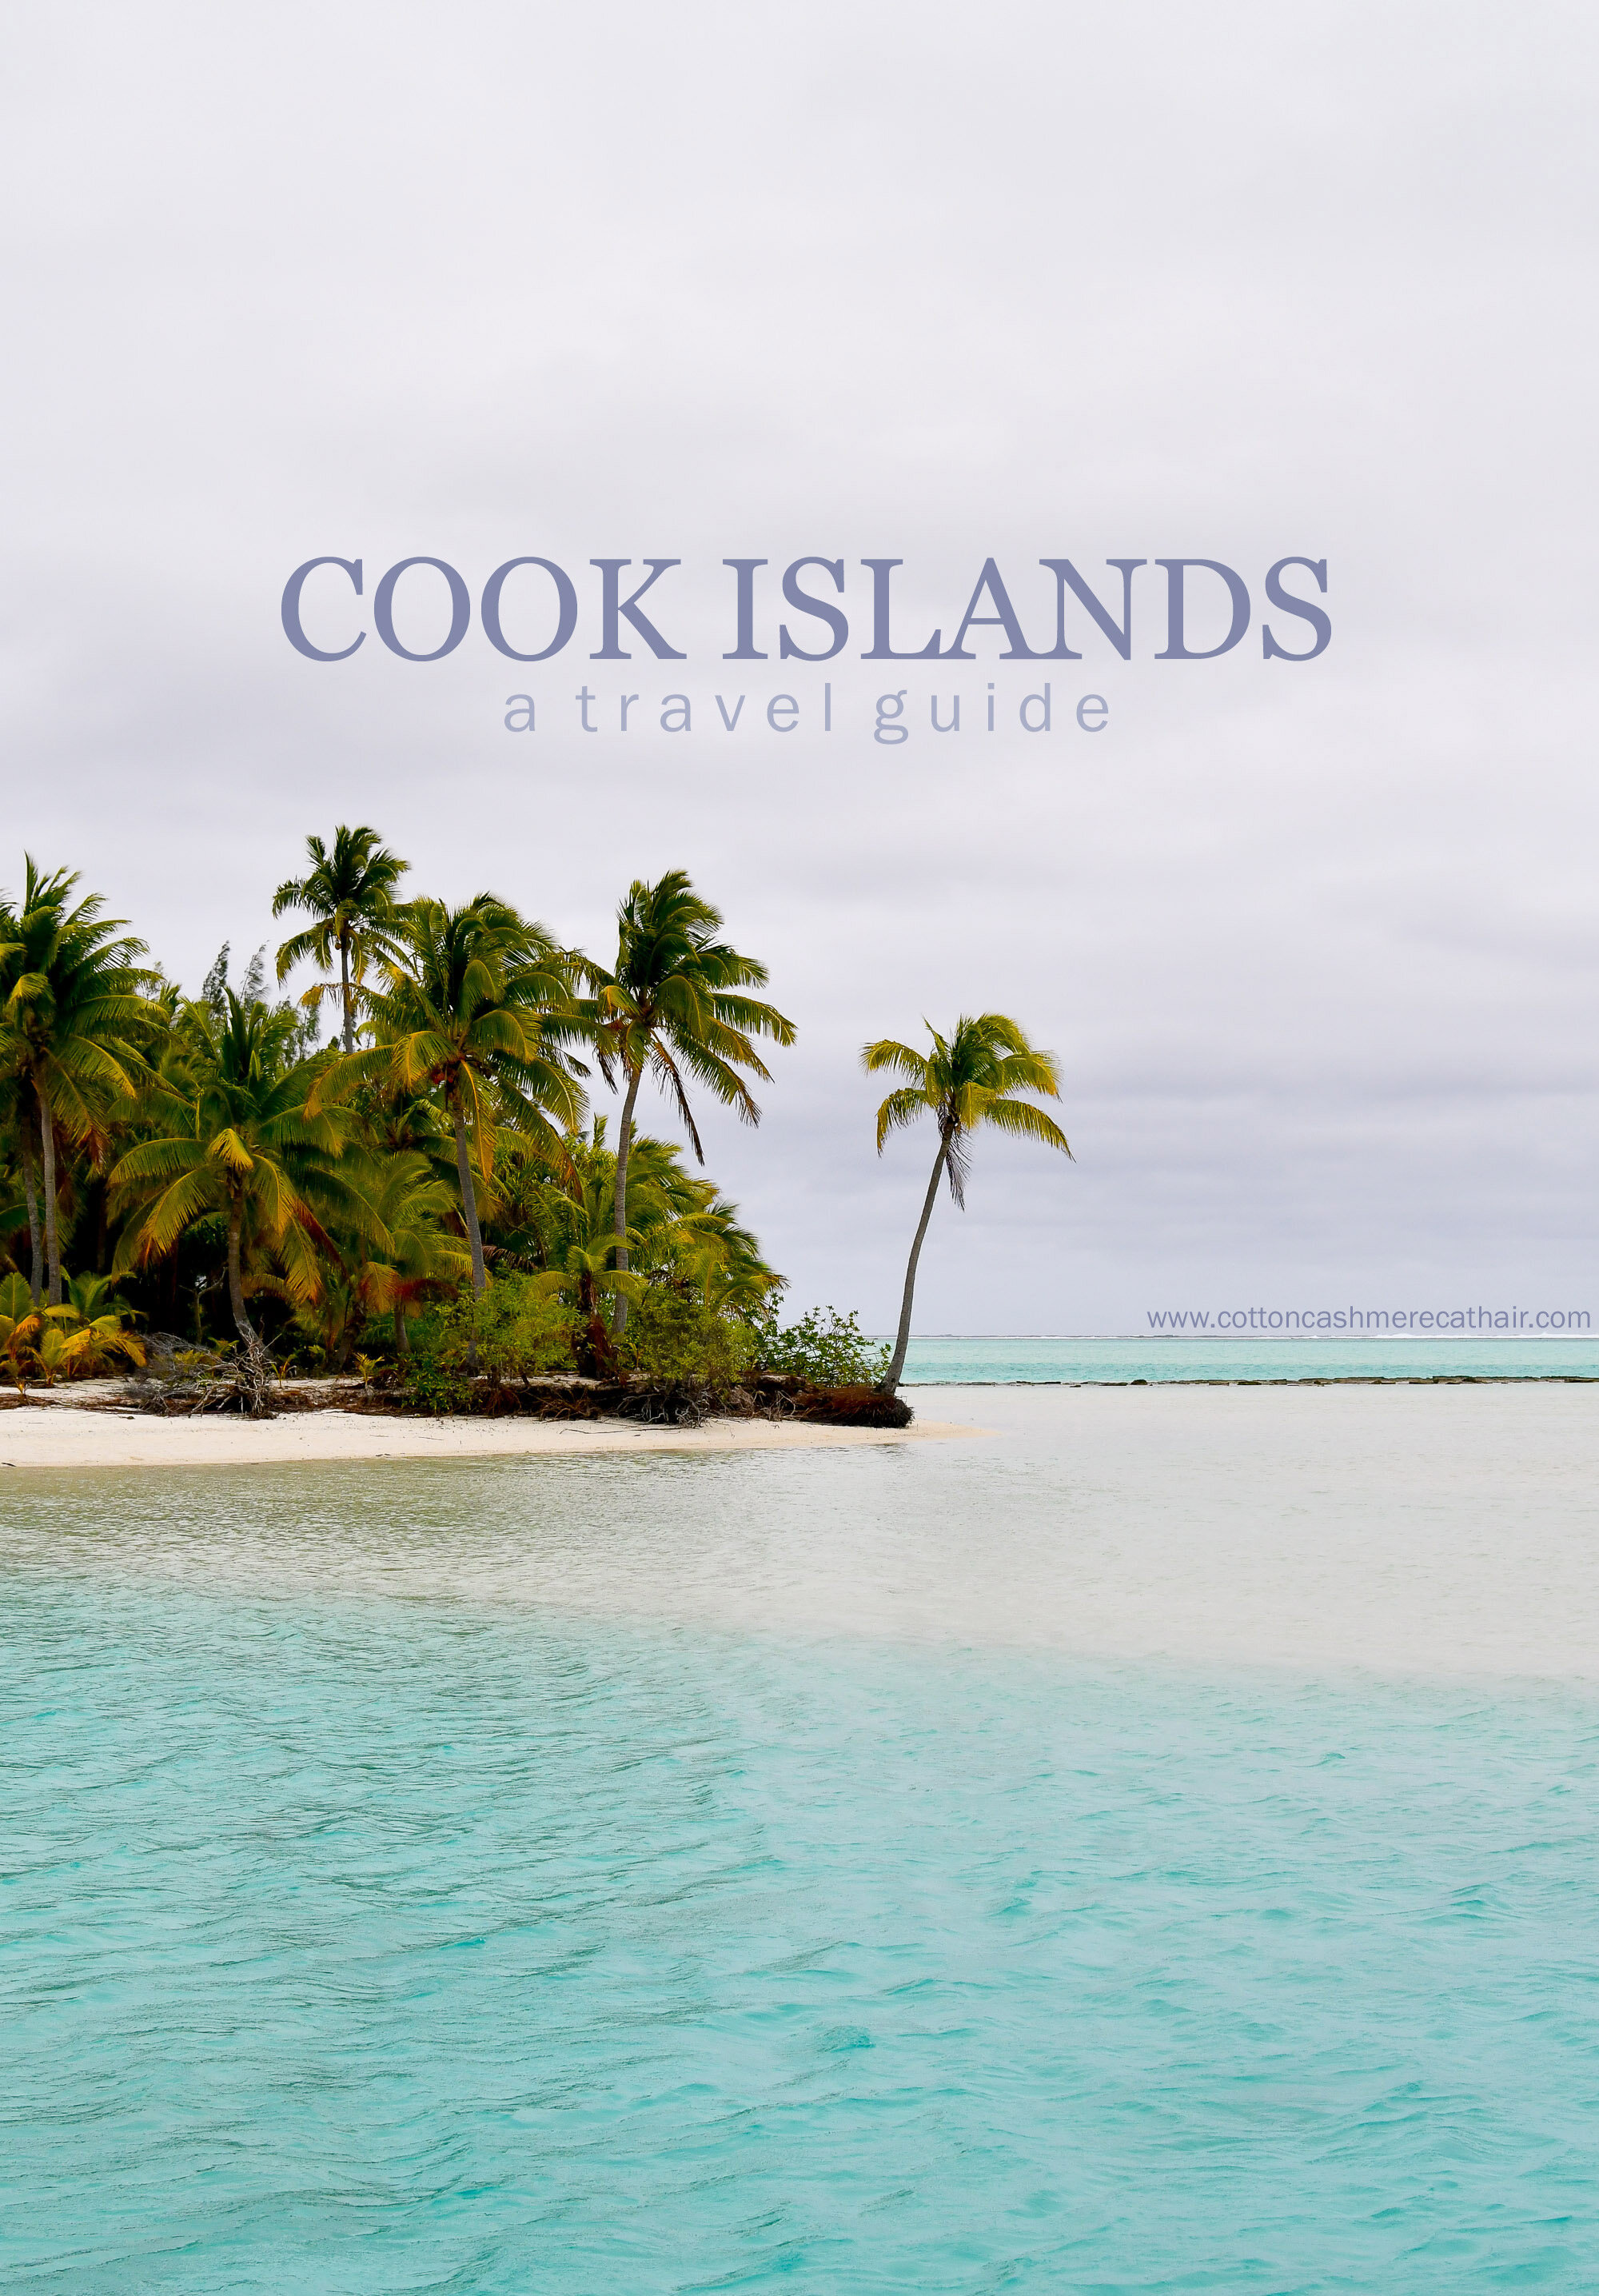 Cook Islands Travel Guide: Rarotonga and Aitutaki — Cotton Cashmere Cat Hair